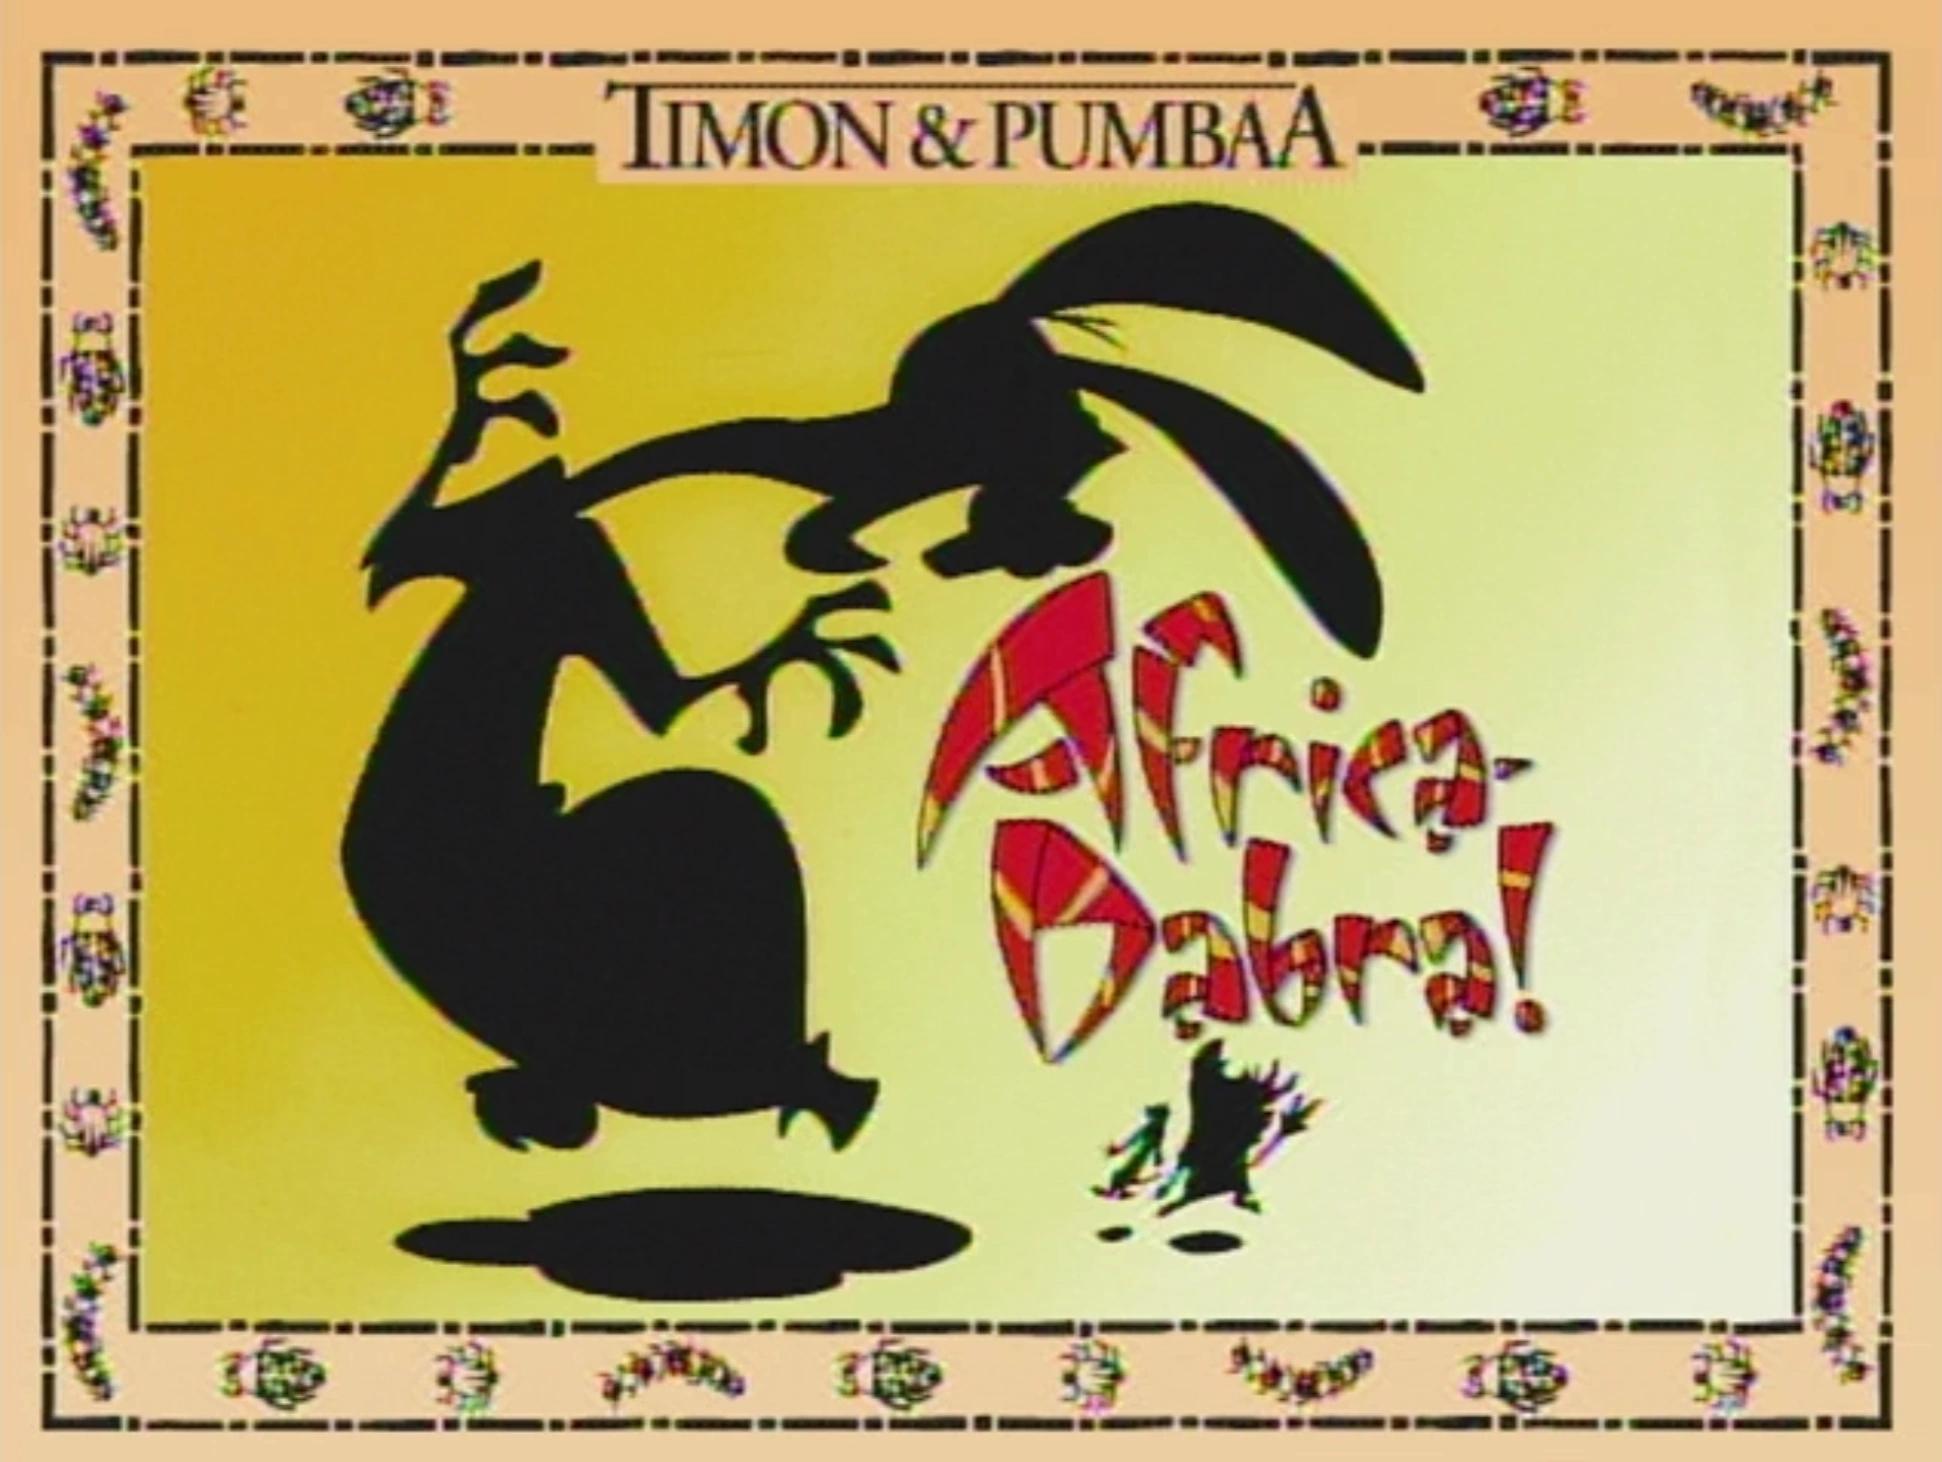 Africa-Dabra!